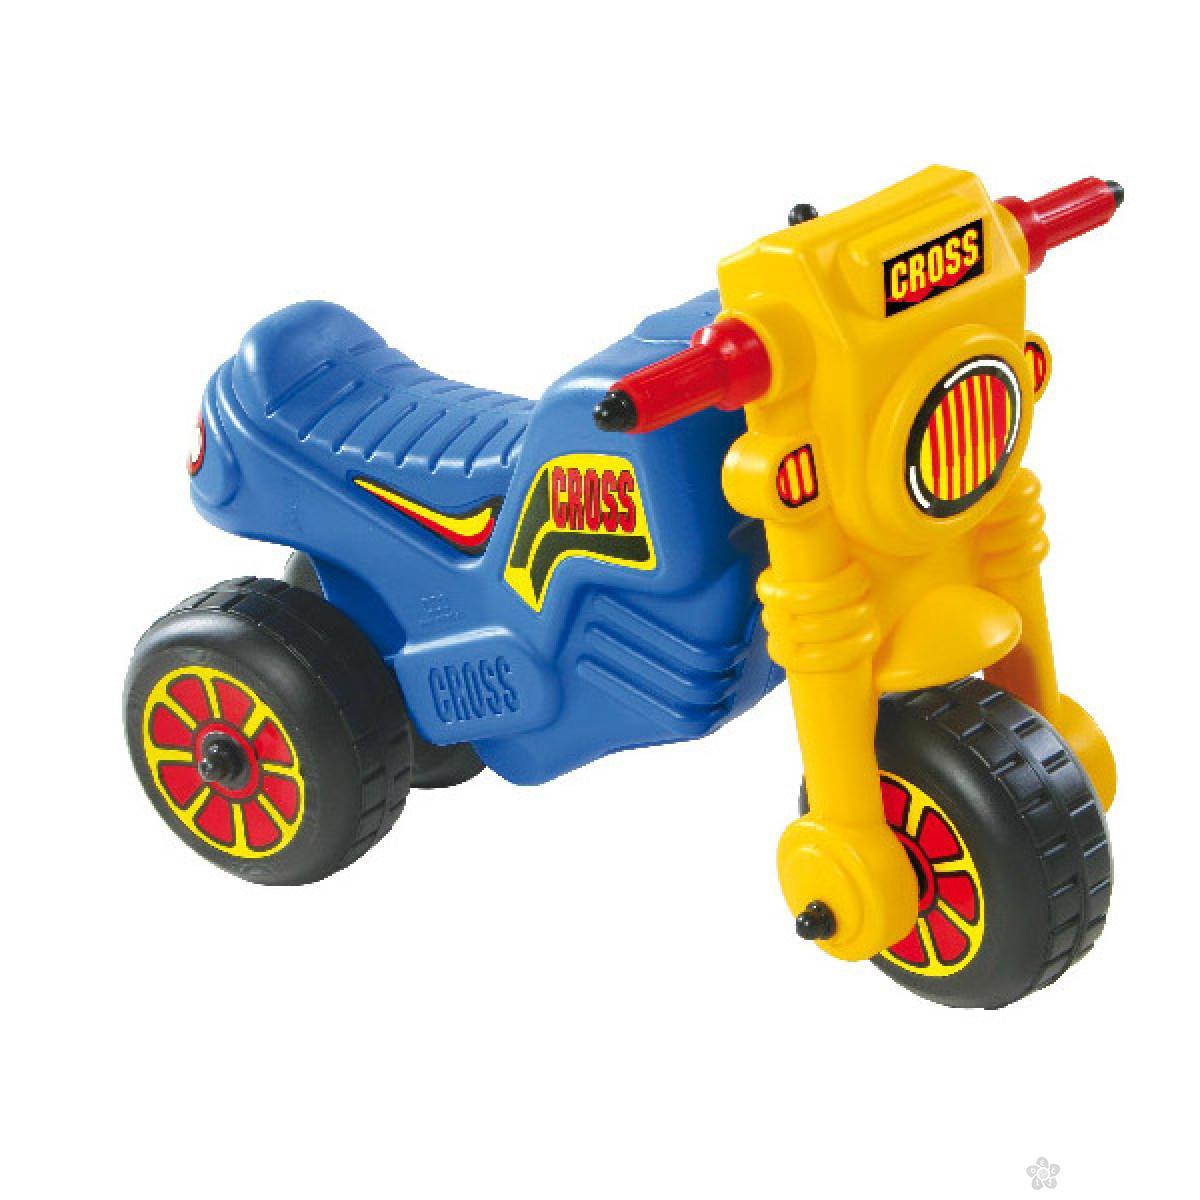 Dečija guralica Cross 1 Motor Bike plava, 540113